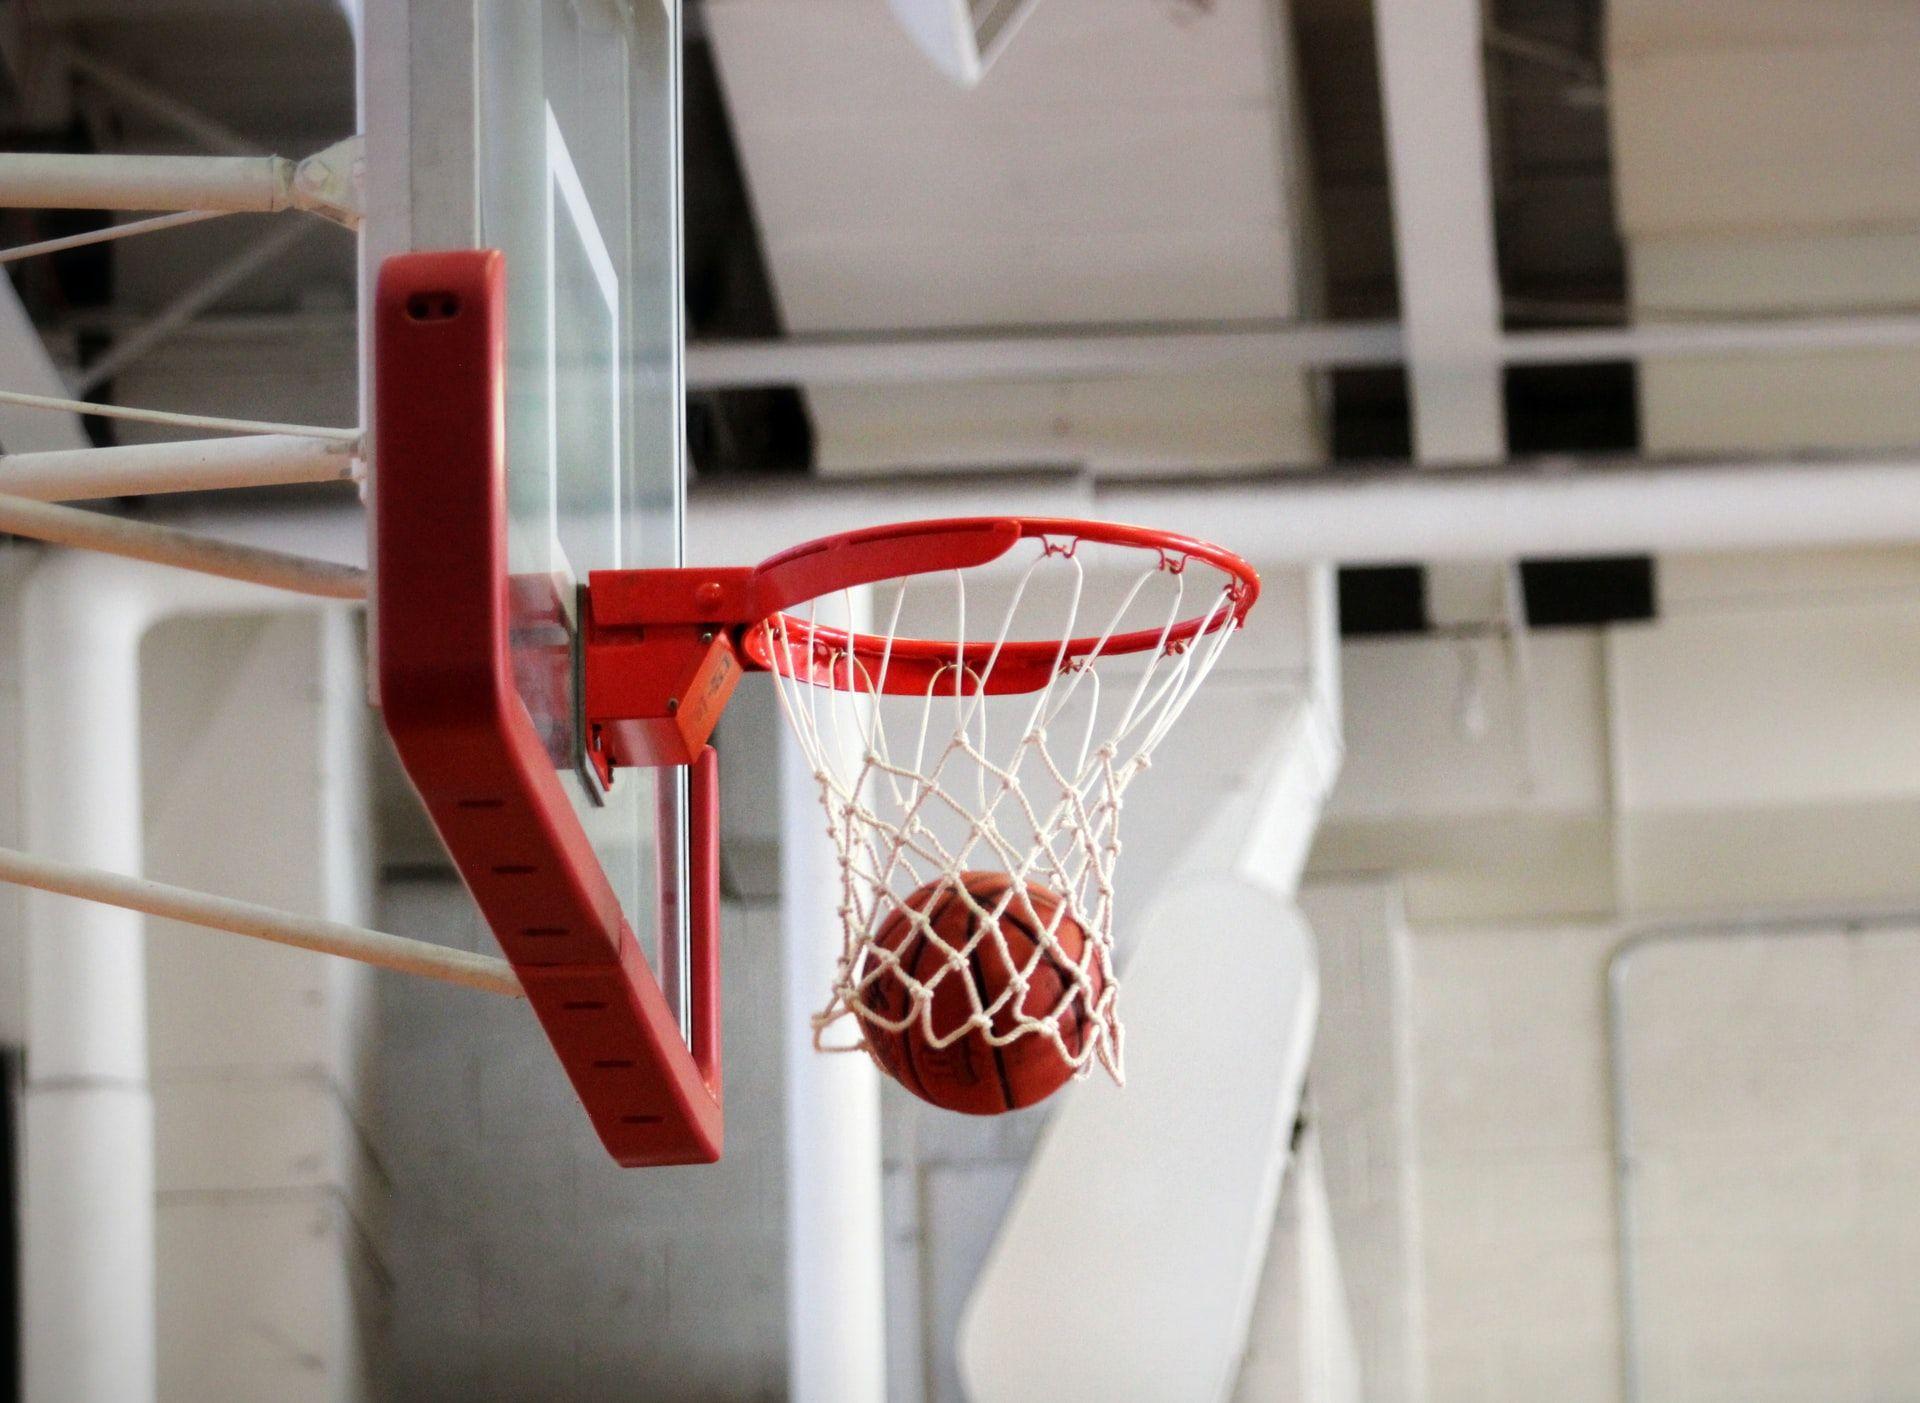 Basket ball hitting the net